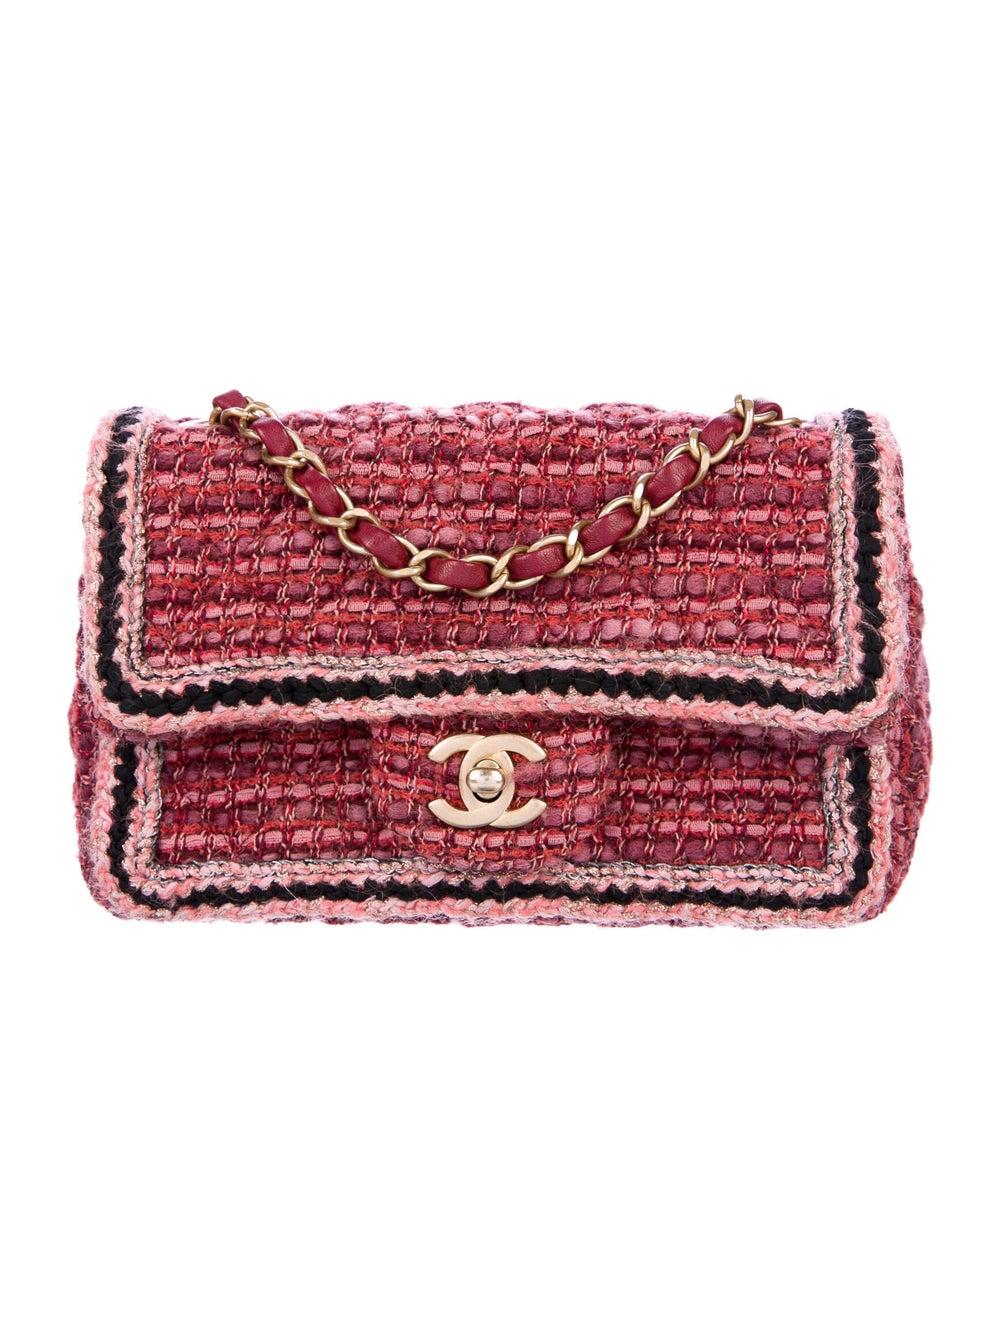 Chanel Tweed Braid Mini Flap Bag Red - image 1